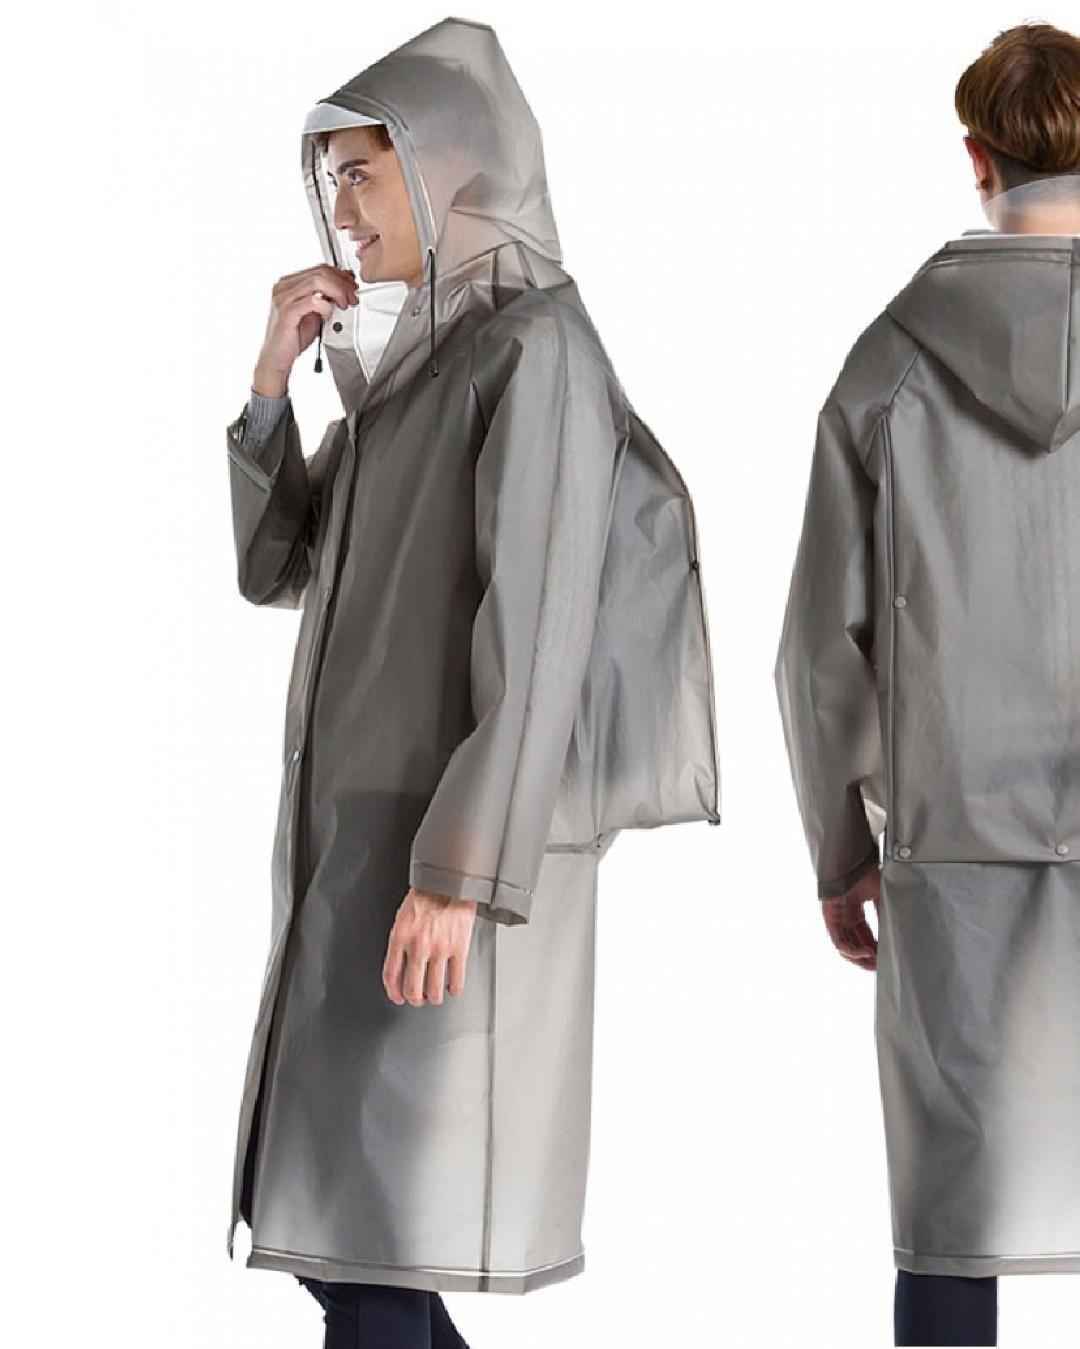 Clear Raincoat Coat Rainwear Hooded Waterproof Women Men transparent new Hot